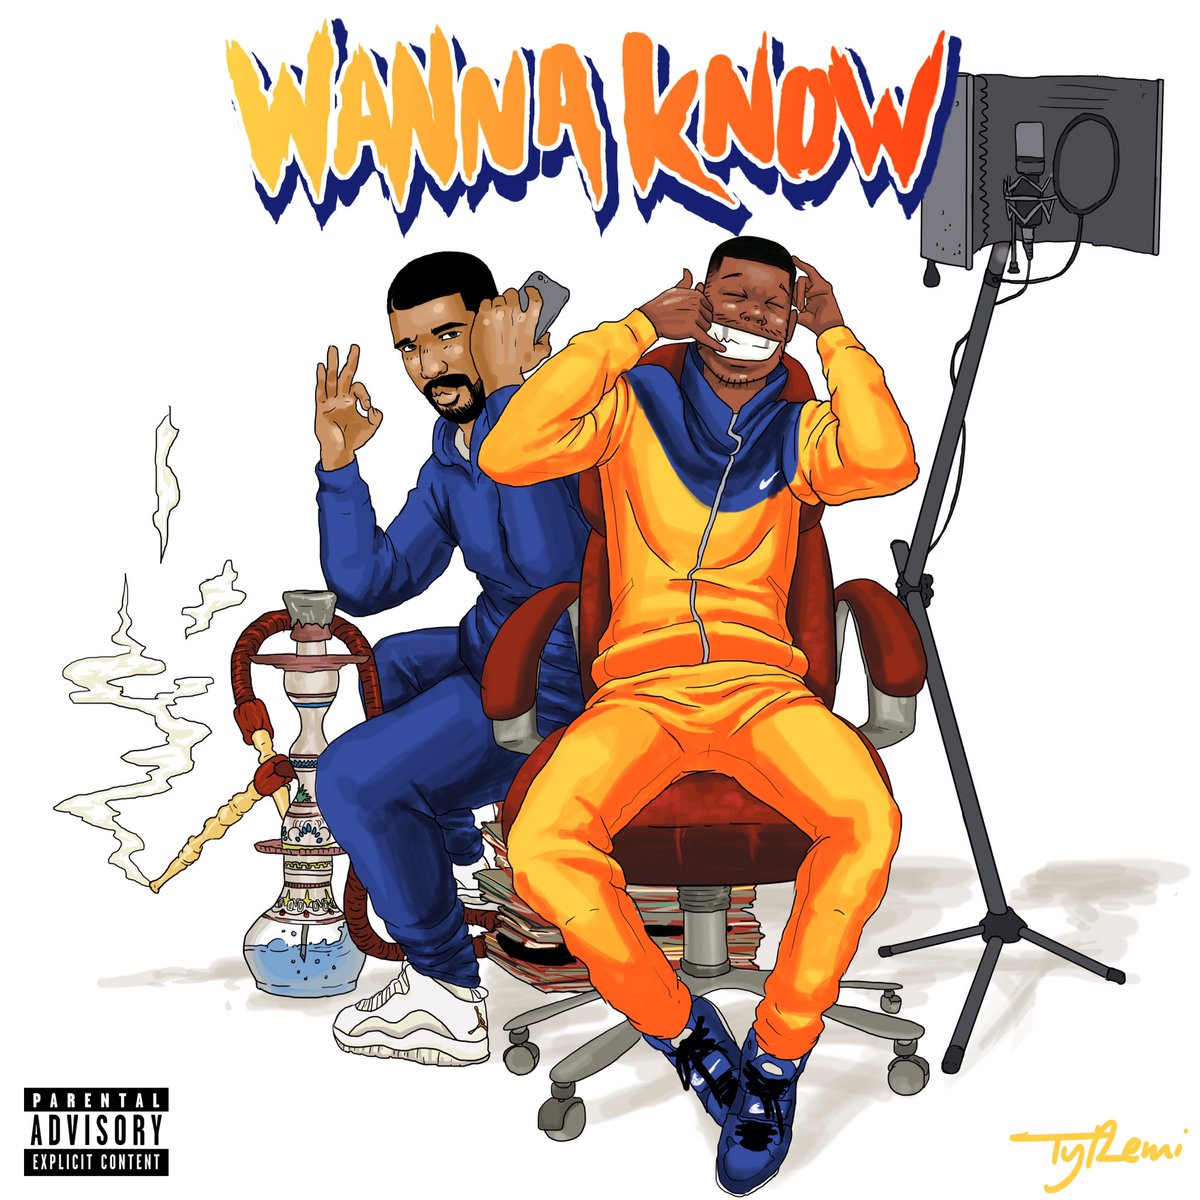 Dave - Wanna Know ft. Drake out now: https://t.co/XrjWJwDDWD https://t.co/dDstGklh06